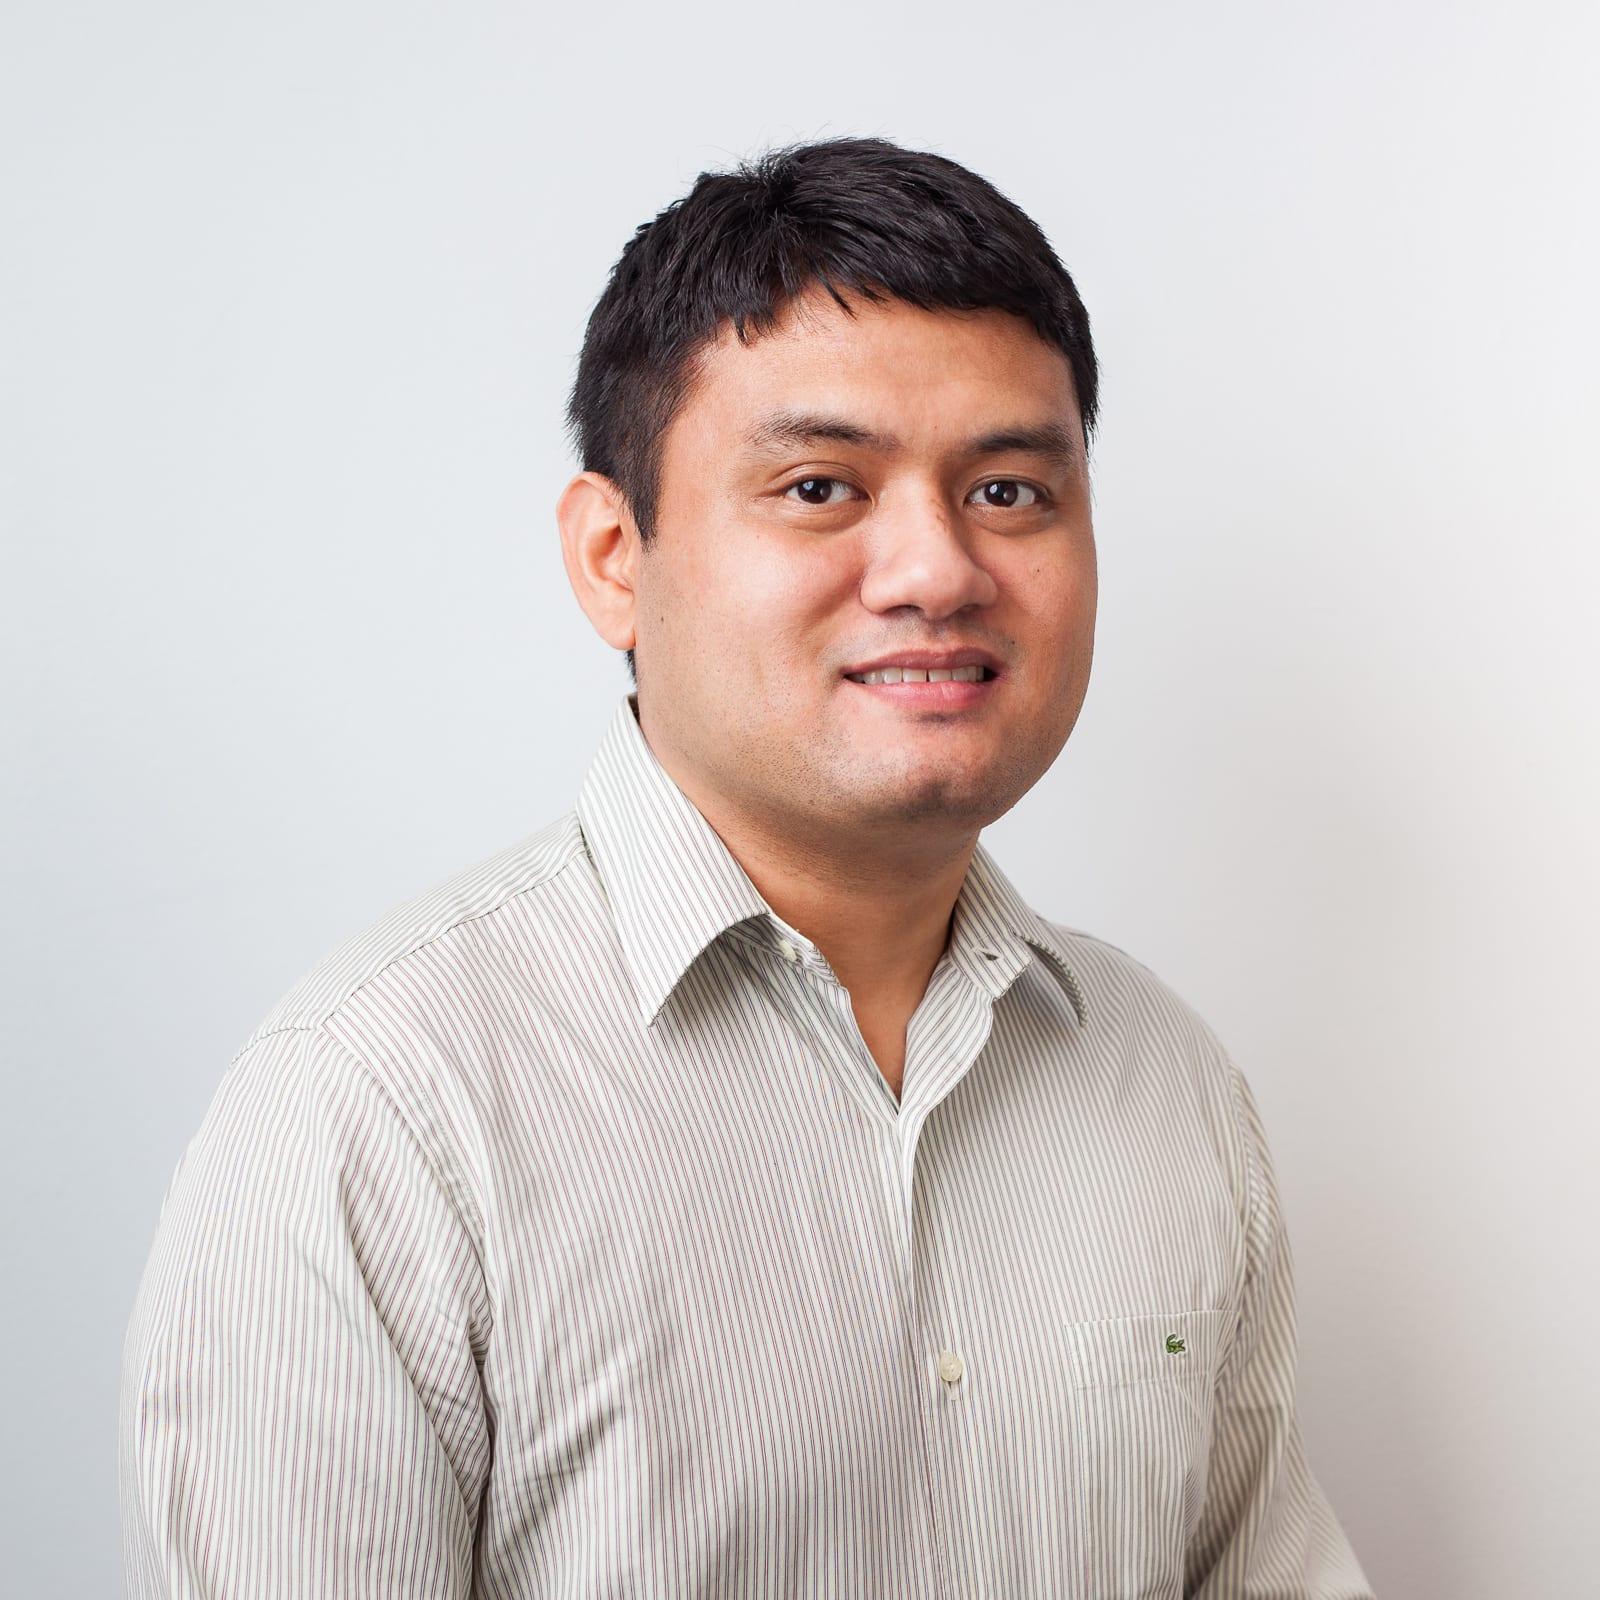 Ansel Andro Santos, Experimentation Analyst